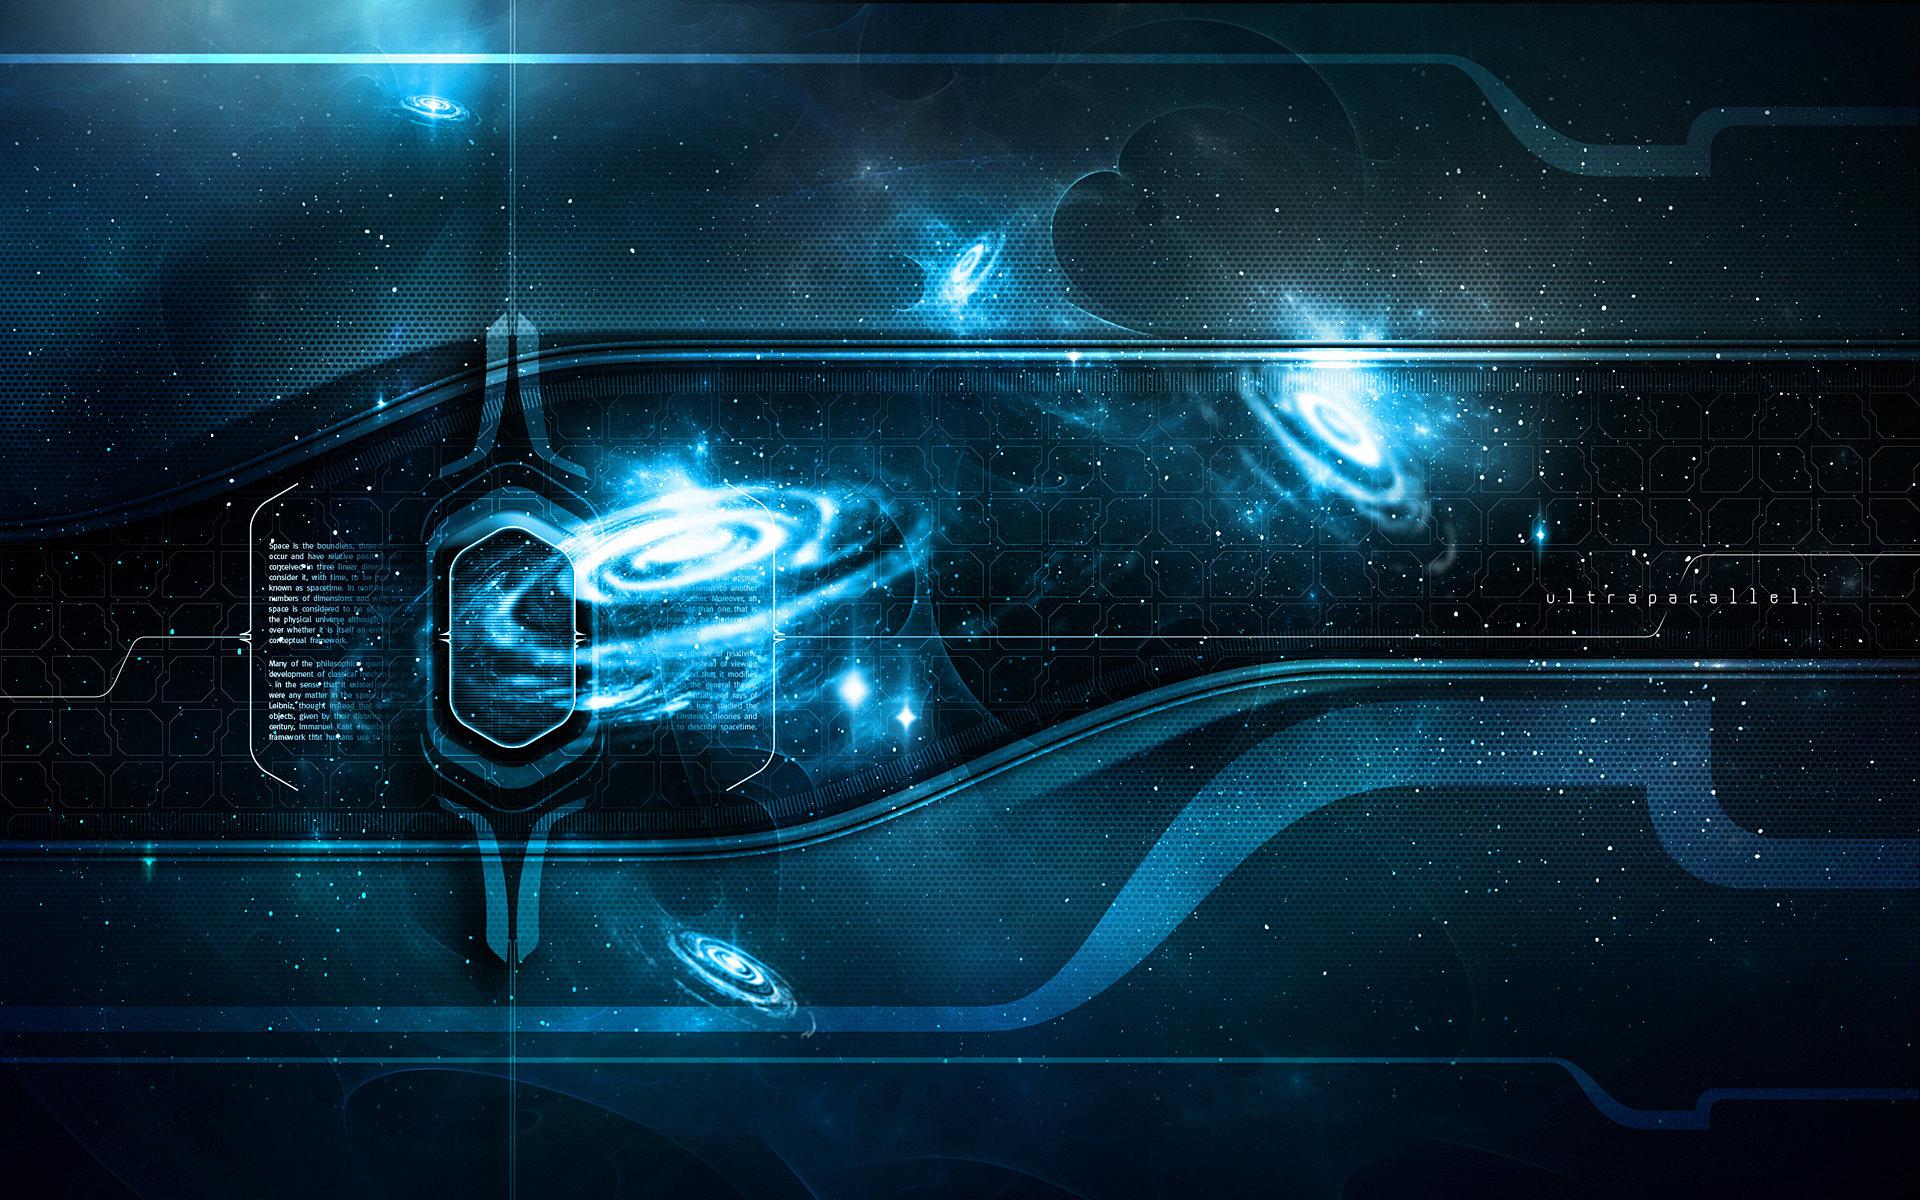 Hd wallpaper themes - Theme Bin Blog Archive Ultraparallel Quasar Blue Hd Wallpaper